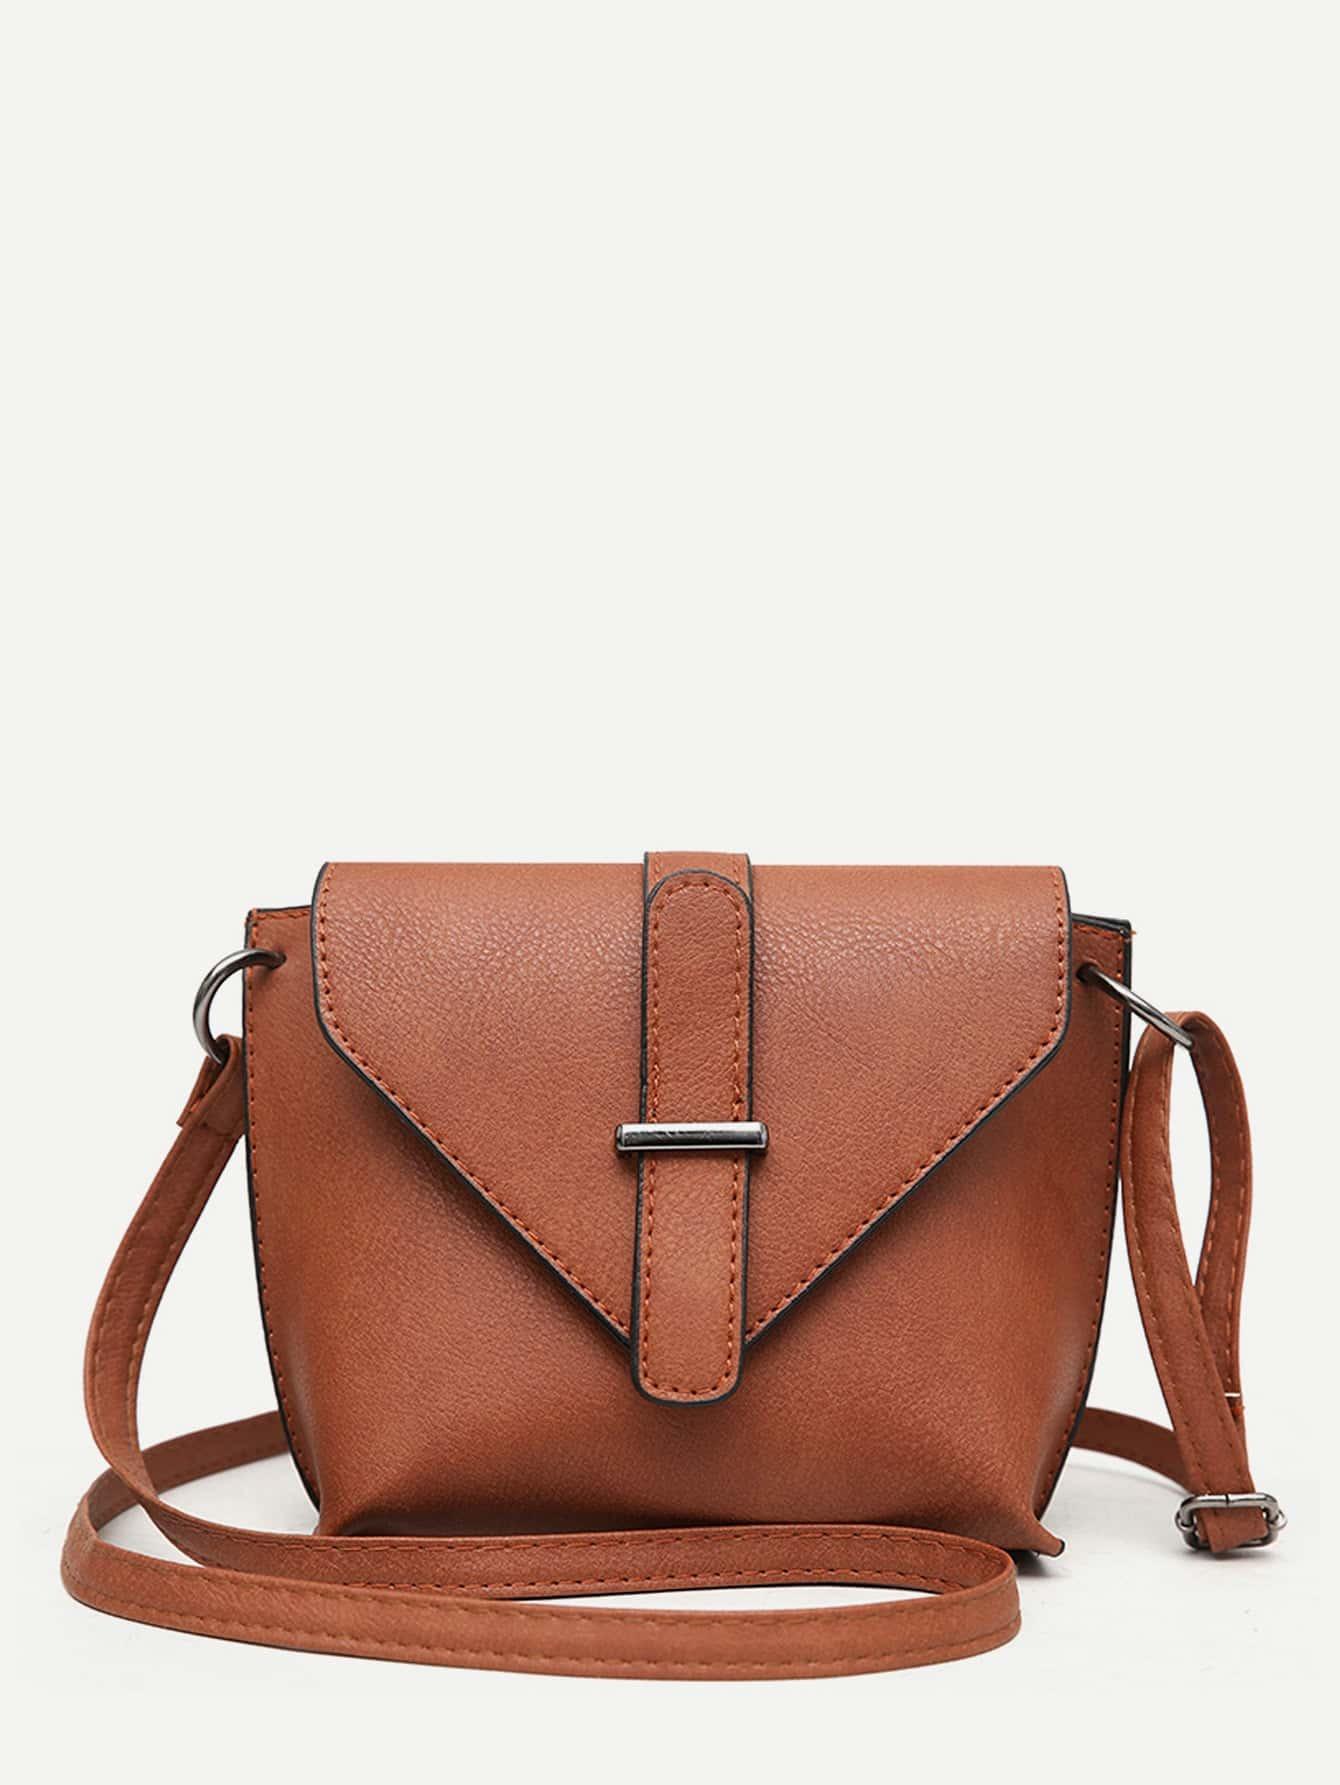 Buckle Detail Flap Shoulder Bag buckle detail flap grab bag